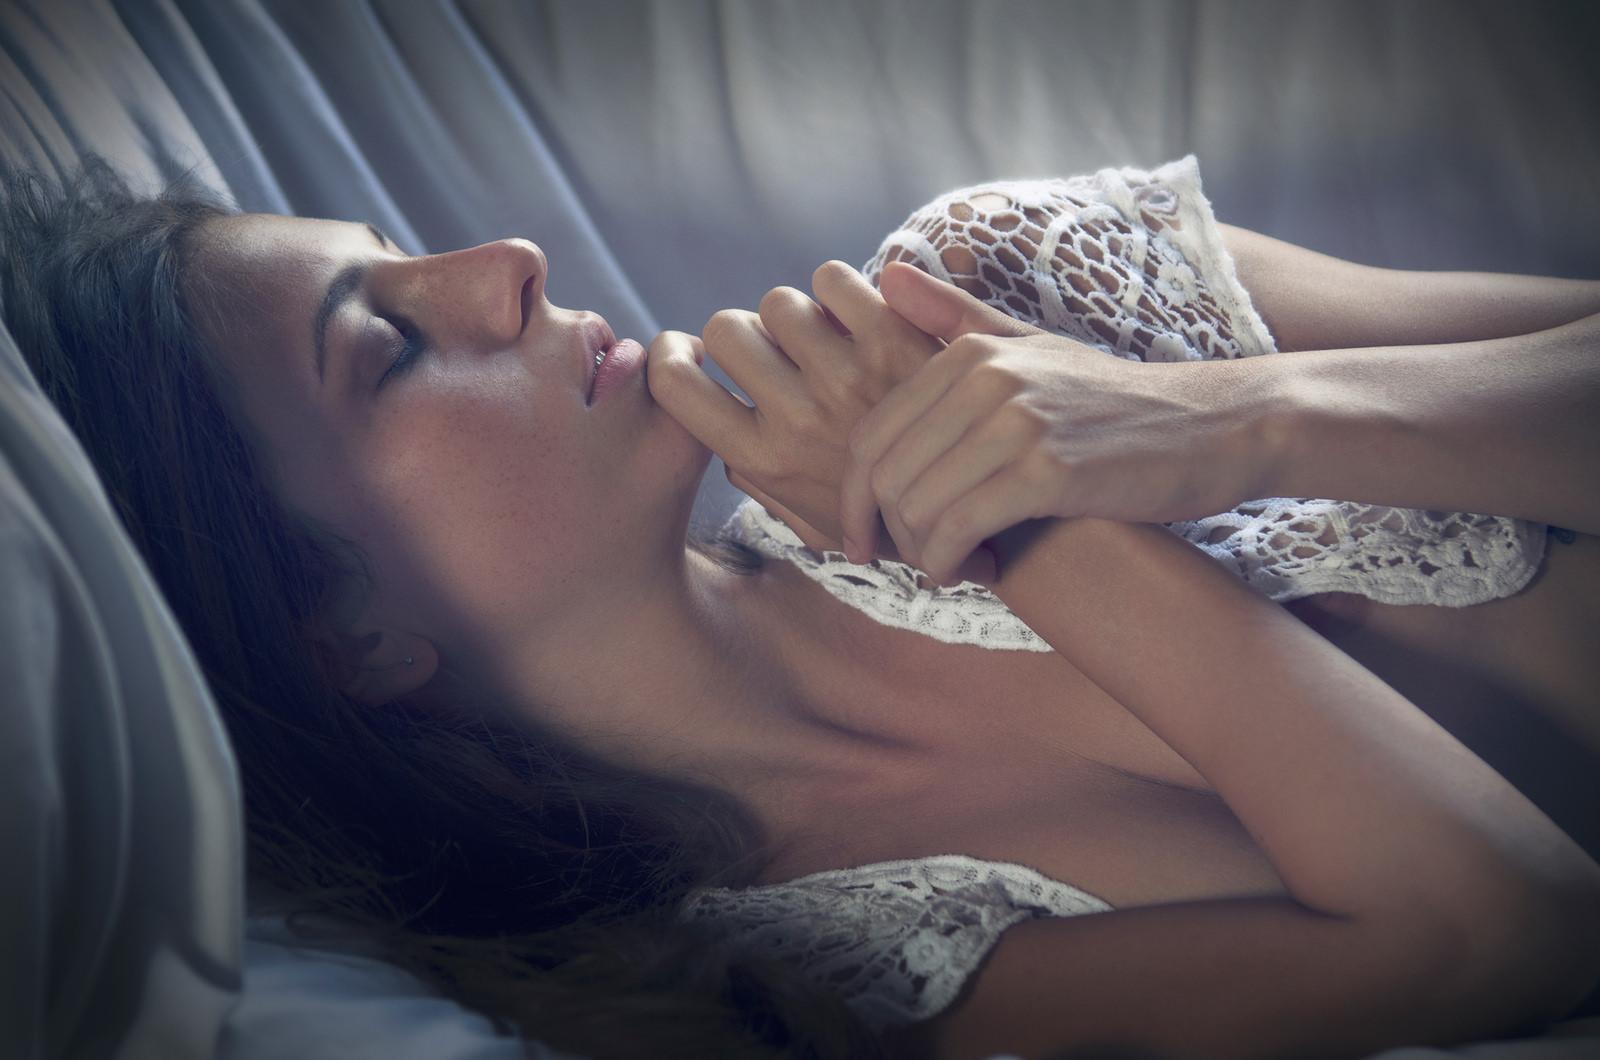 Bianca Effy nudes (35 photos), foto Selfie, Twitter, legs 2020